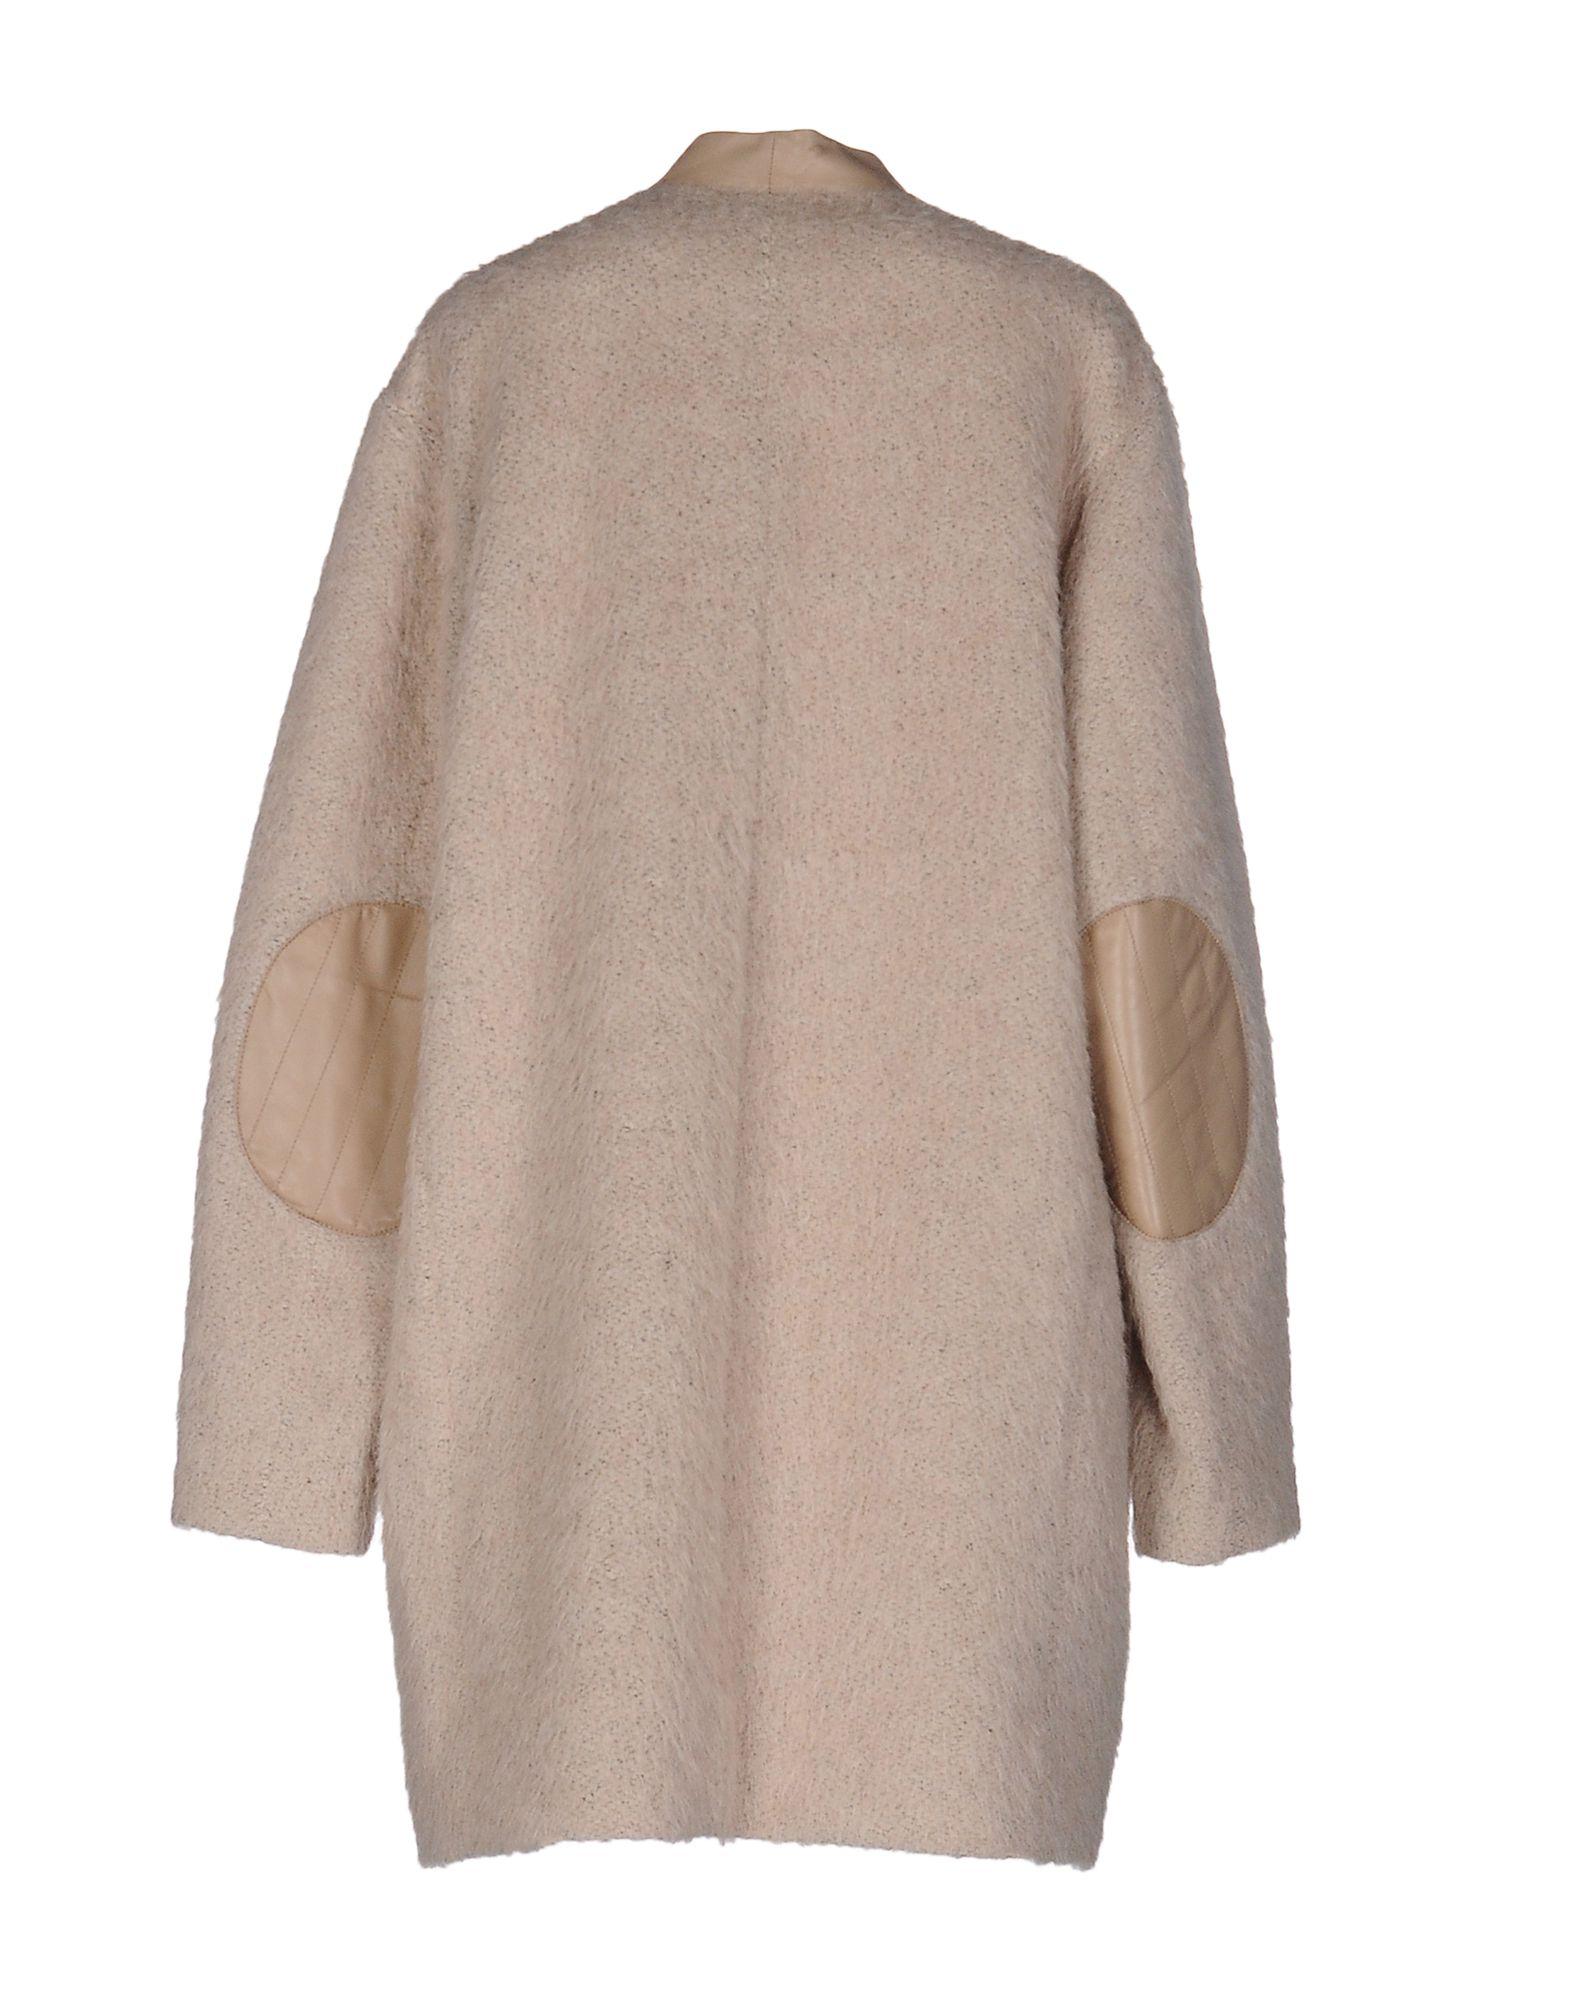 Tibi coats 2